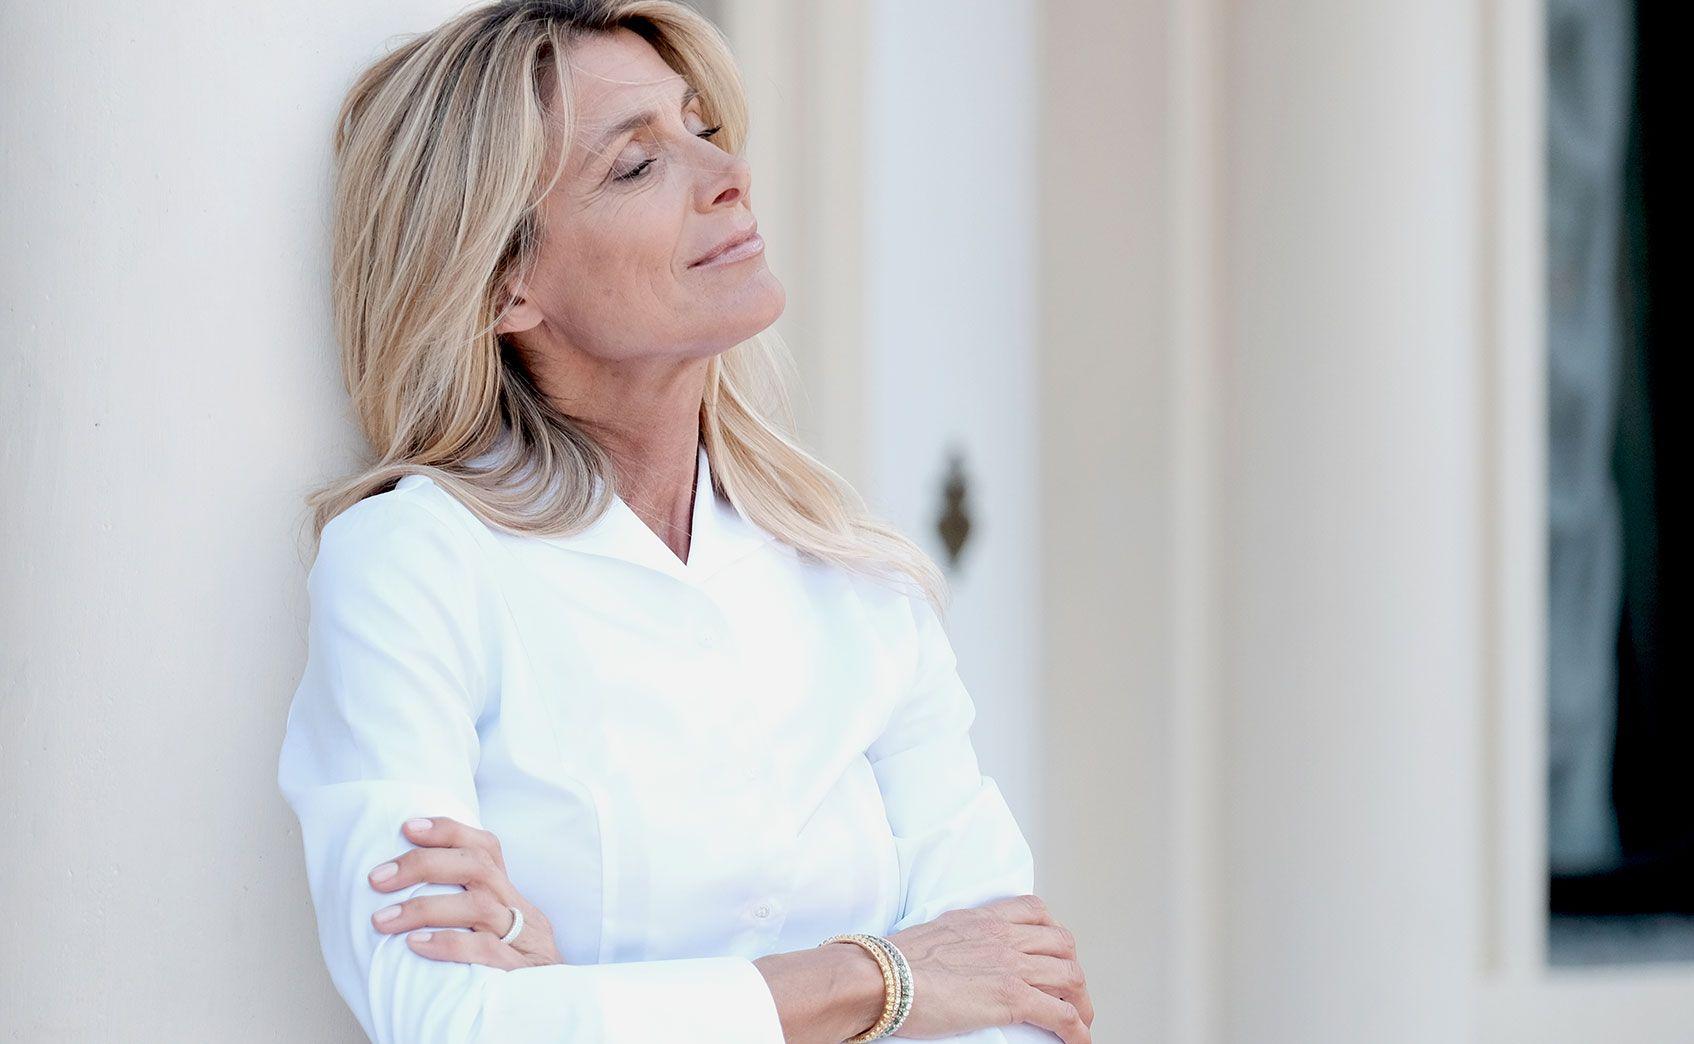 extensible woman elastic tennis bracelet